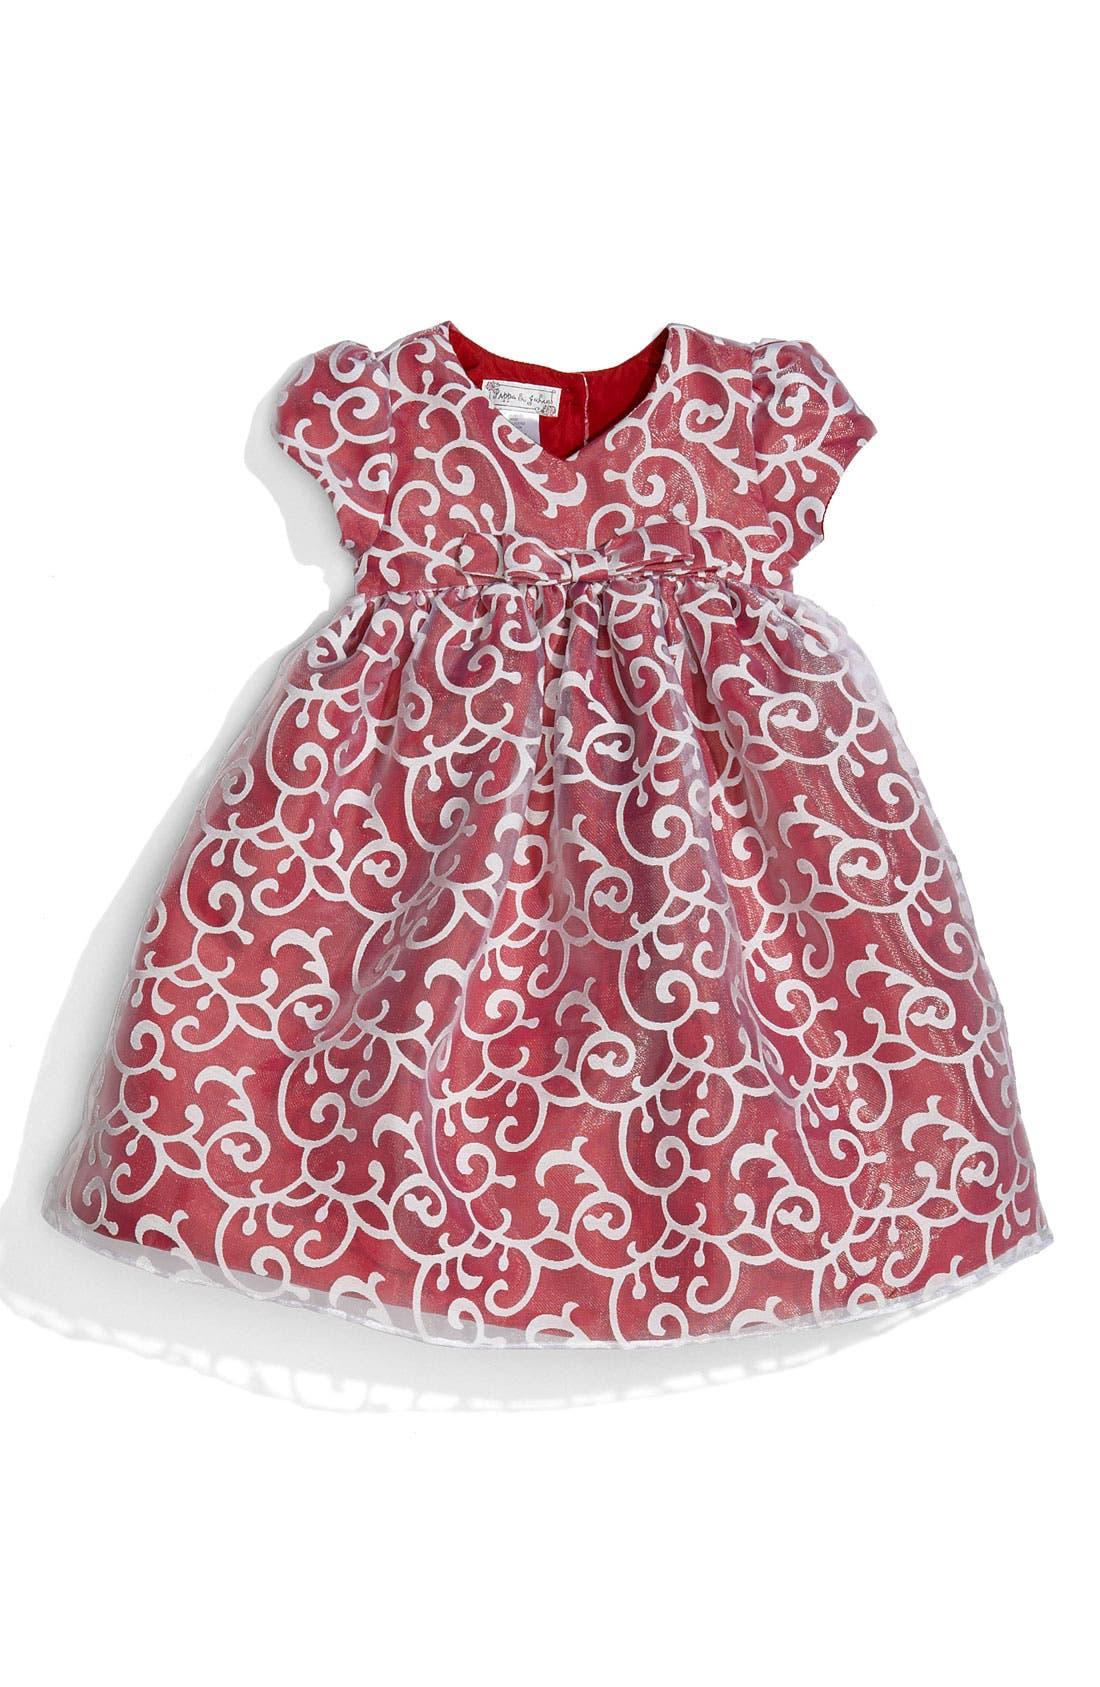 Alternate Image 1 Selected - Pippa & Julie Sateen Dress (Infant)